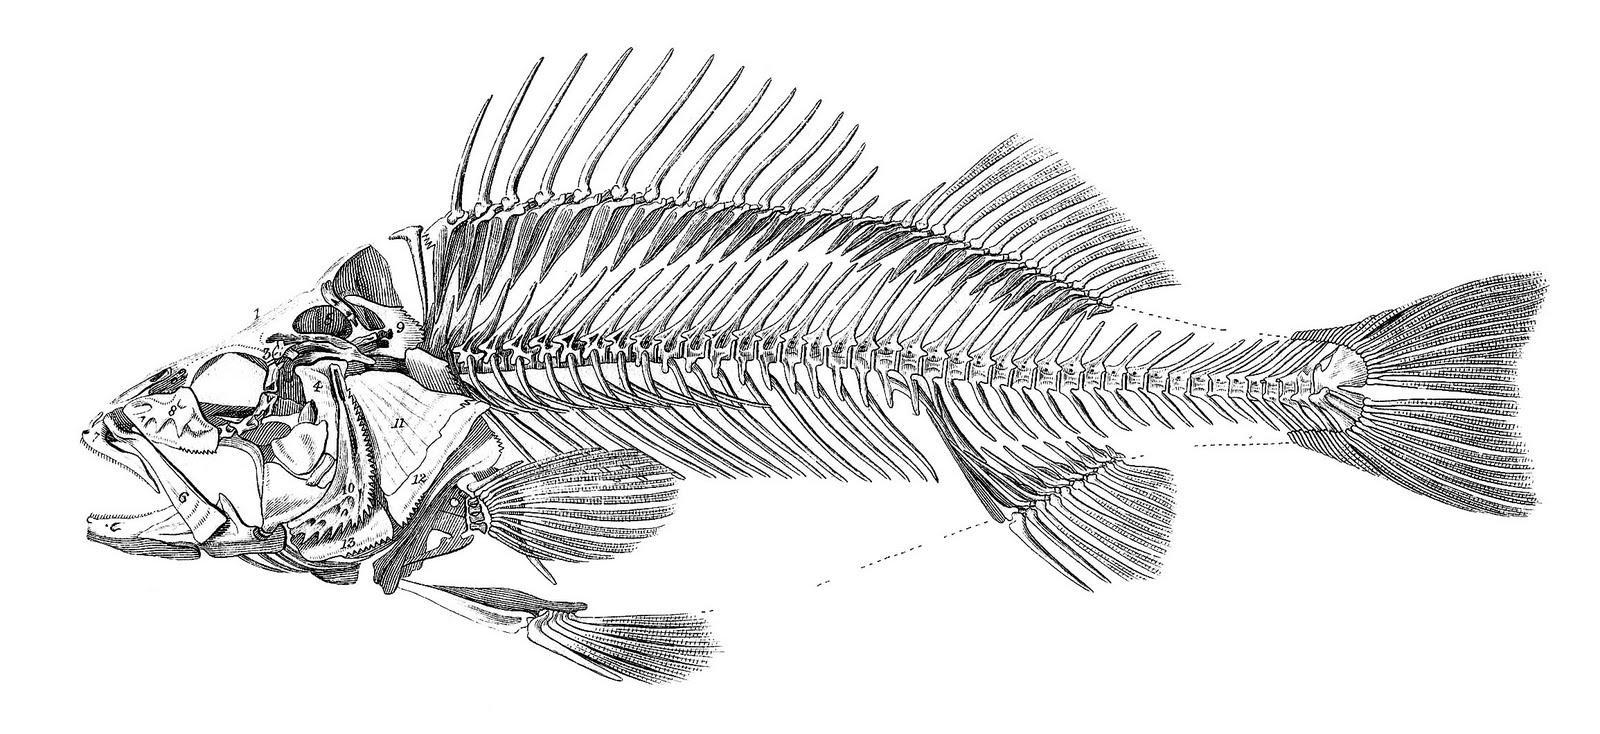 Fish Bones | Free Download Clip Art | Free Clip Art | On Clipart Regarding Fish Bone Wall Art (Image 13 of 20)